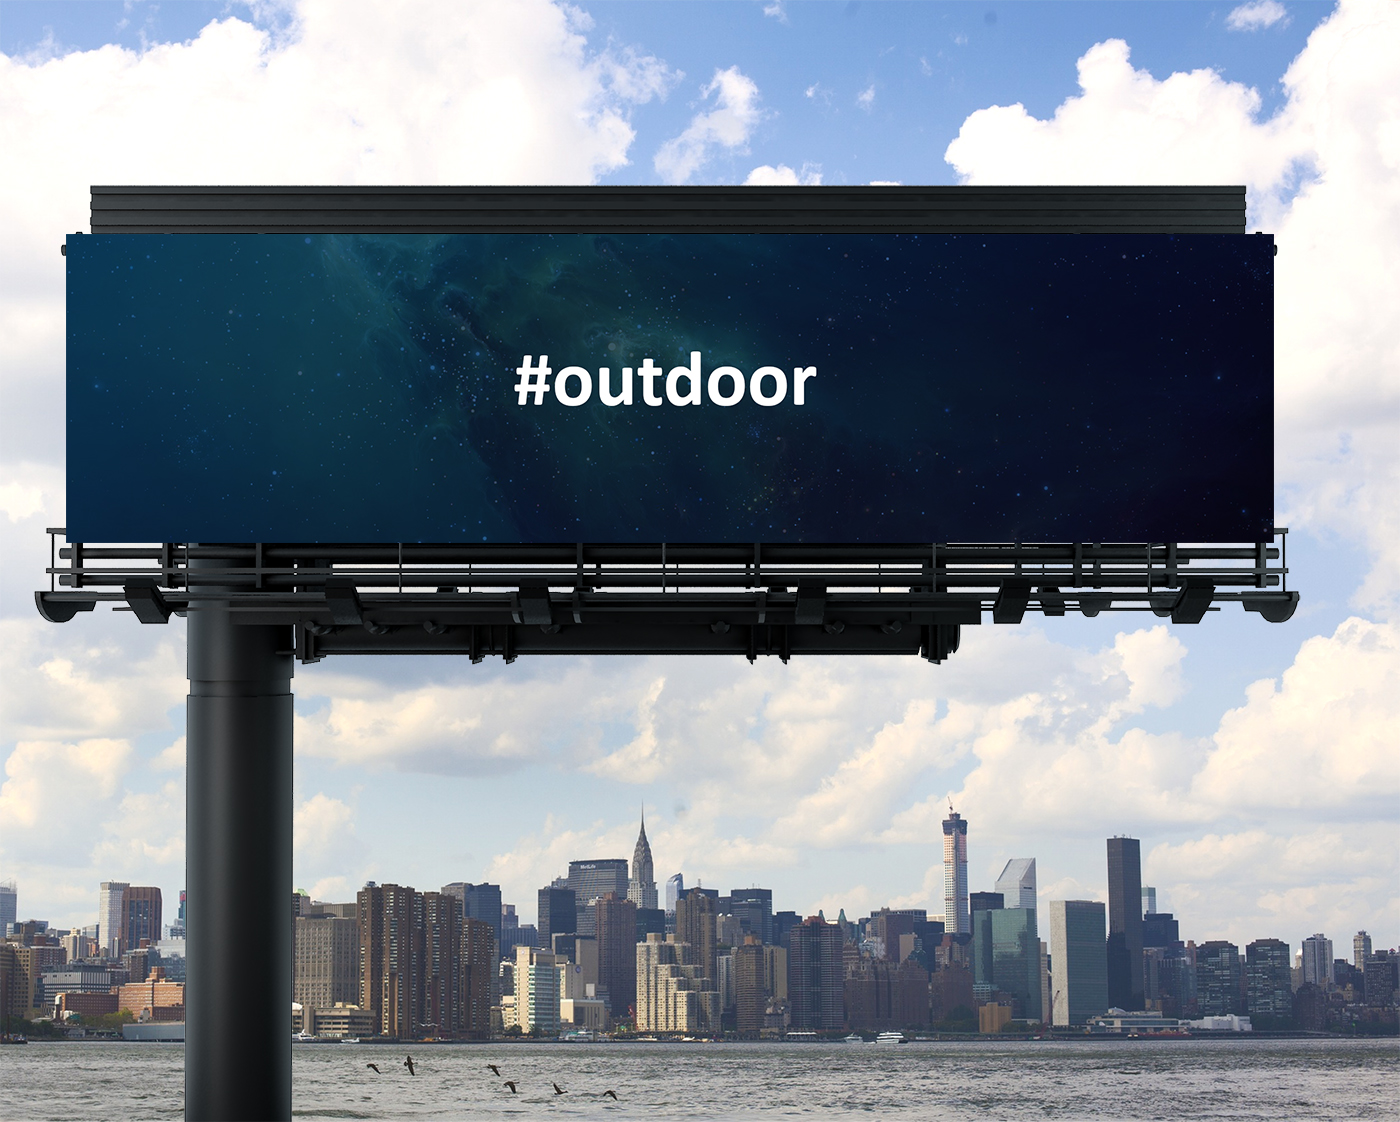 outdoor_jele_agencja reklamowa_nillboard_plakat_film_event